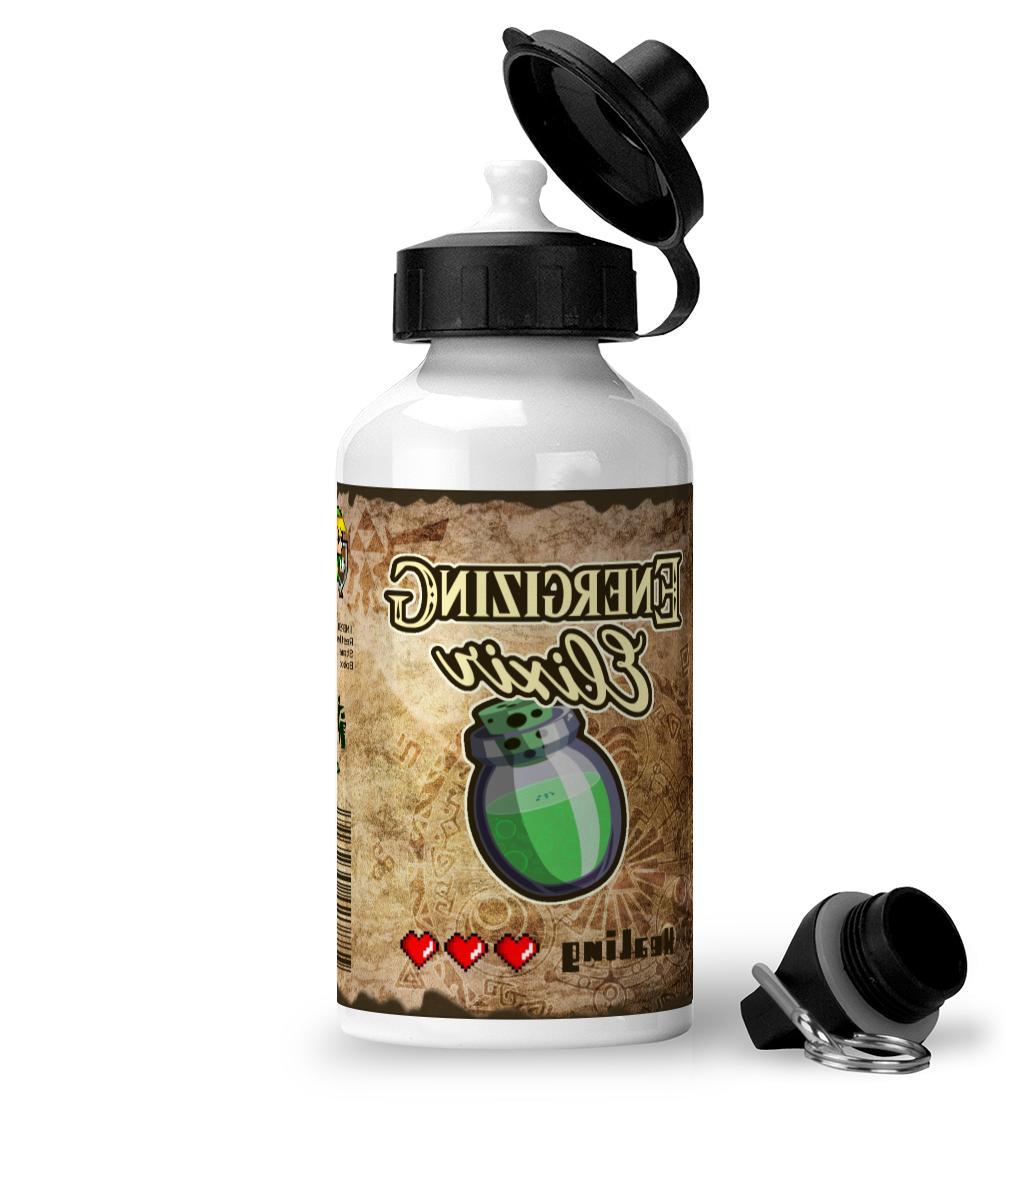 legend of zelda energizing elixir gamers aluminium